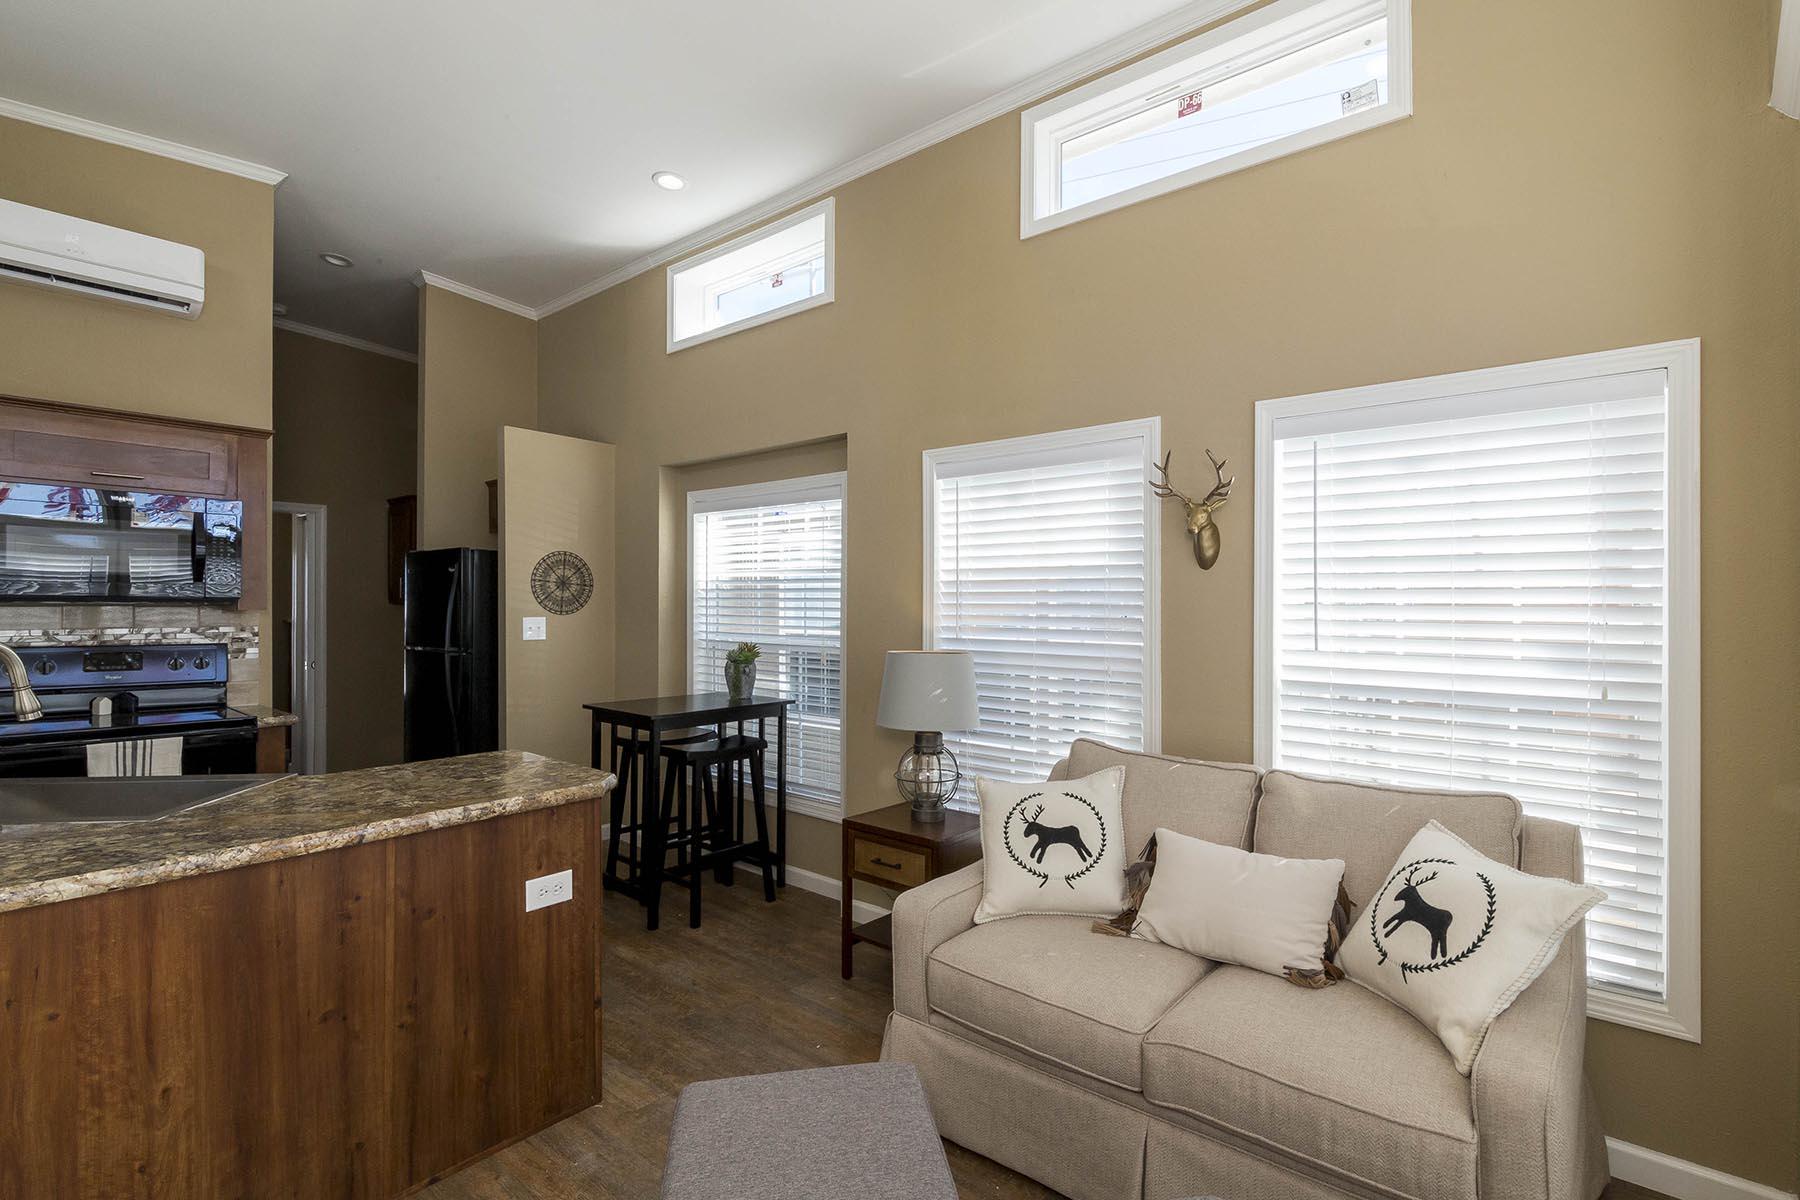 The Baja APH-532 living room 3